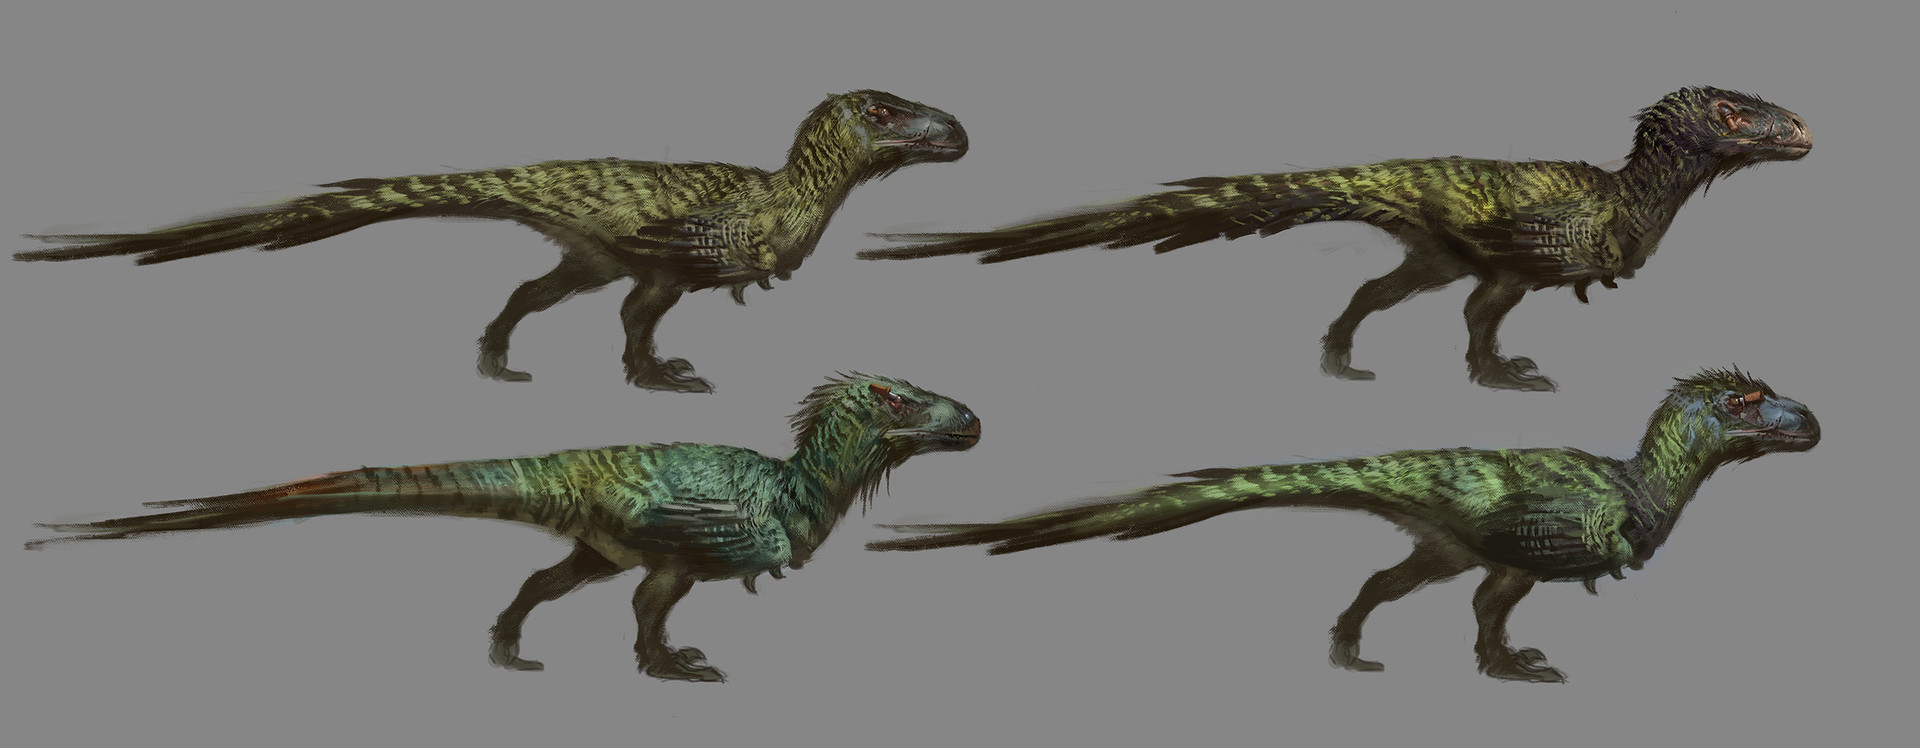 Utahraptor sketches